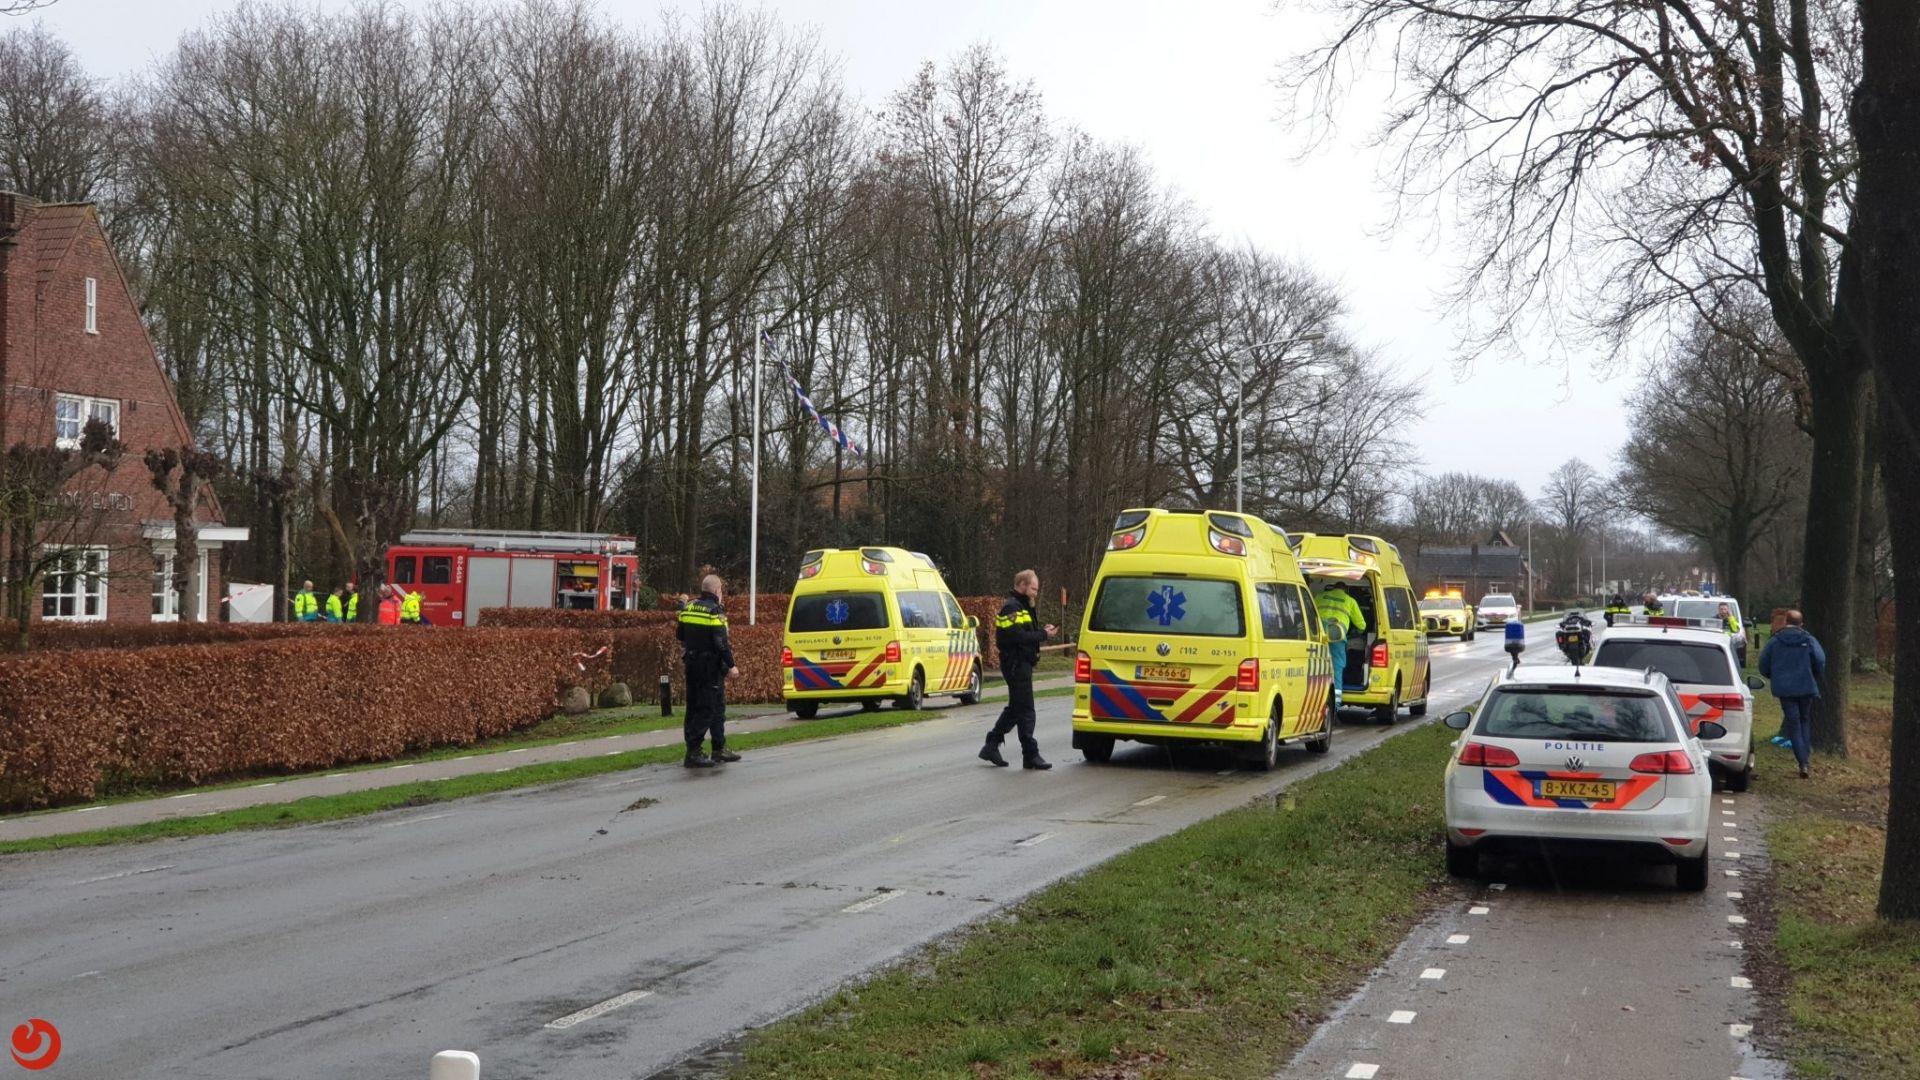 112drachten.nl